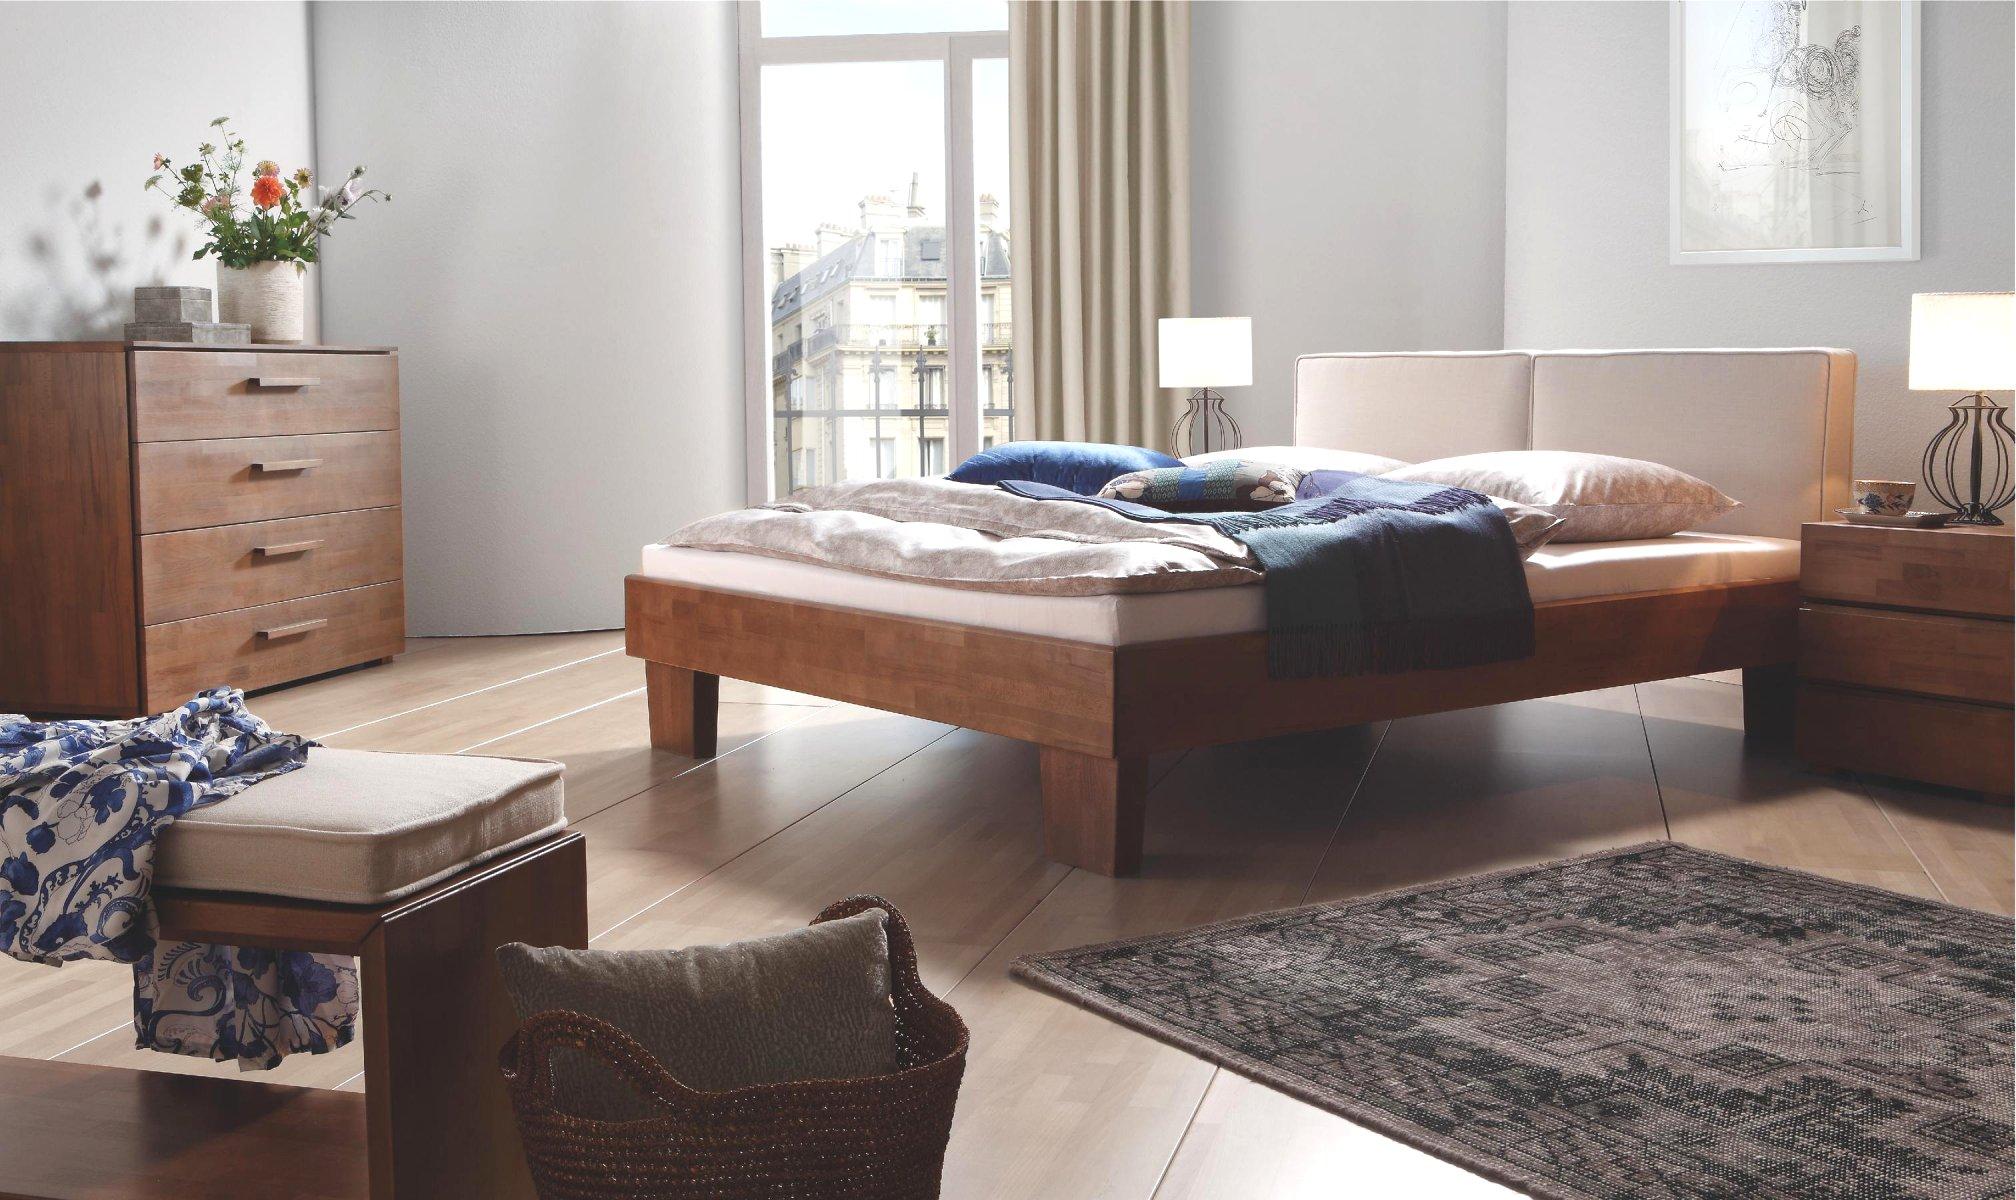 woodline premium tobus cena 140 160 180 200 x 200 220 cm gelbett direkt. Black Bedroom Furniture Sets. Home Design Ideas